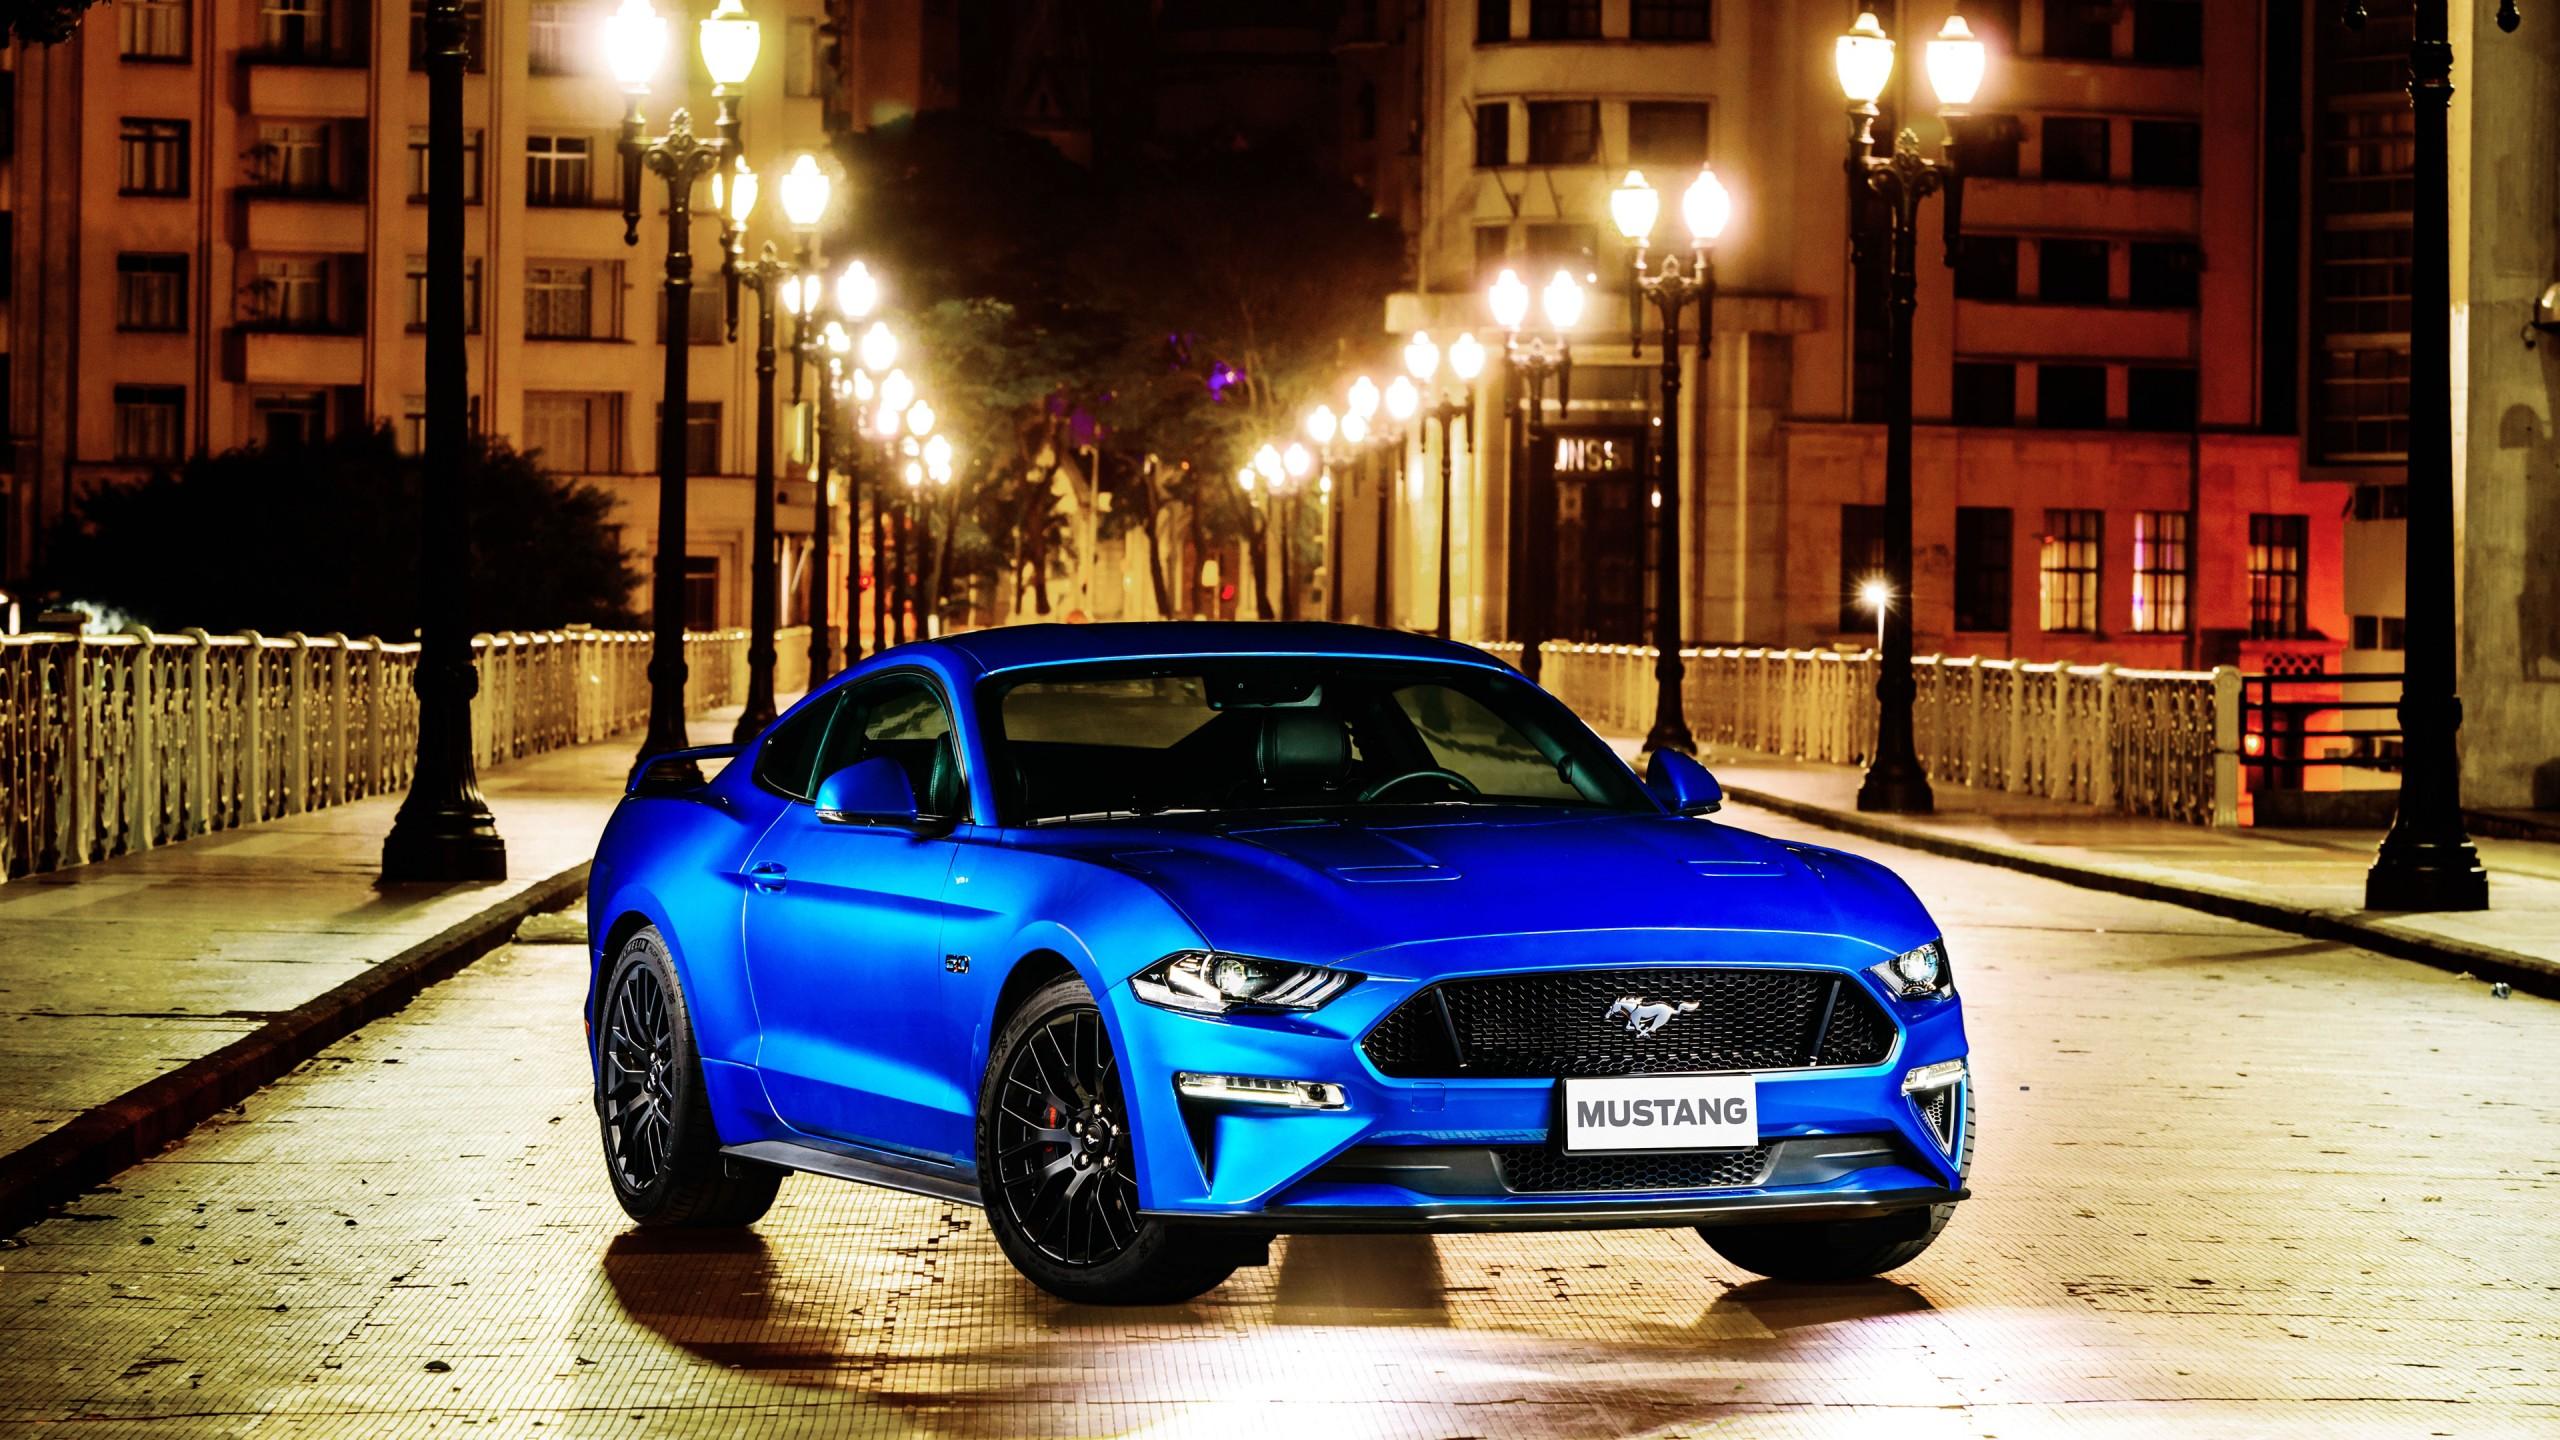 Mustang Wallpaper Iphone X 2018 Ford Mustang Gt Fastback 4k 8 Wallpaper Hd Car